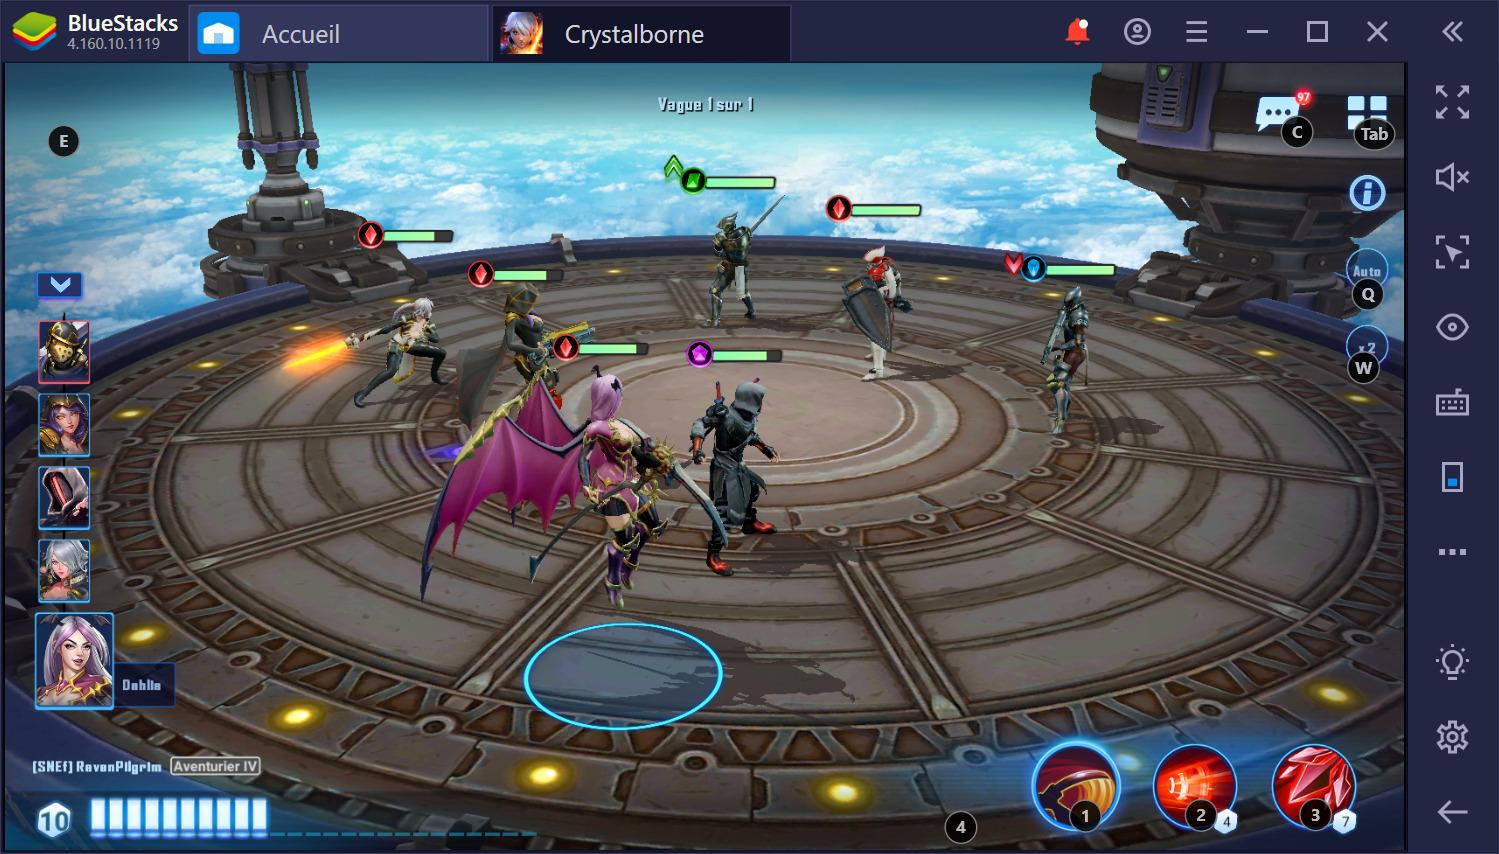 Comment gagner dans Crystalborne Heroes of Fate sur PC avec BlueStacks